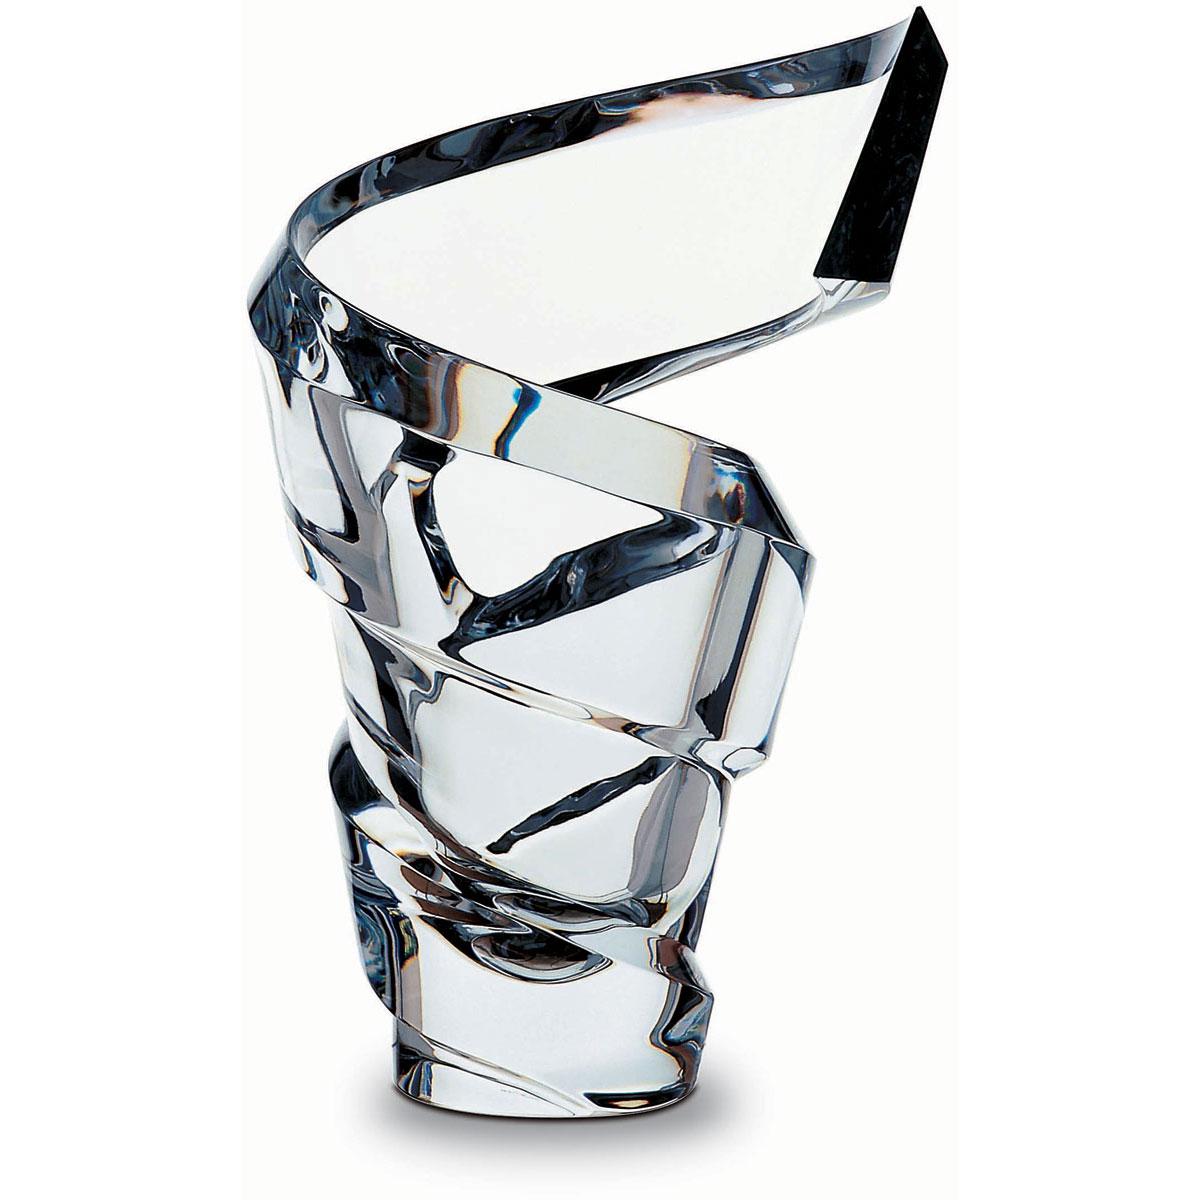 "Baccarat Crystal, Spirale 16"" Crystal Vase, Limited Edition of 500"